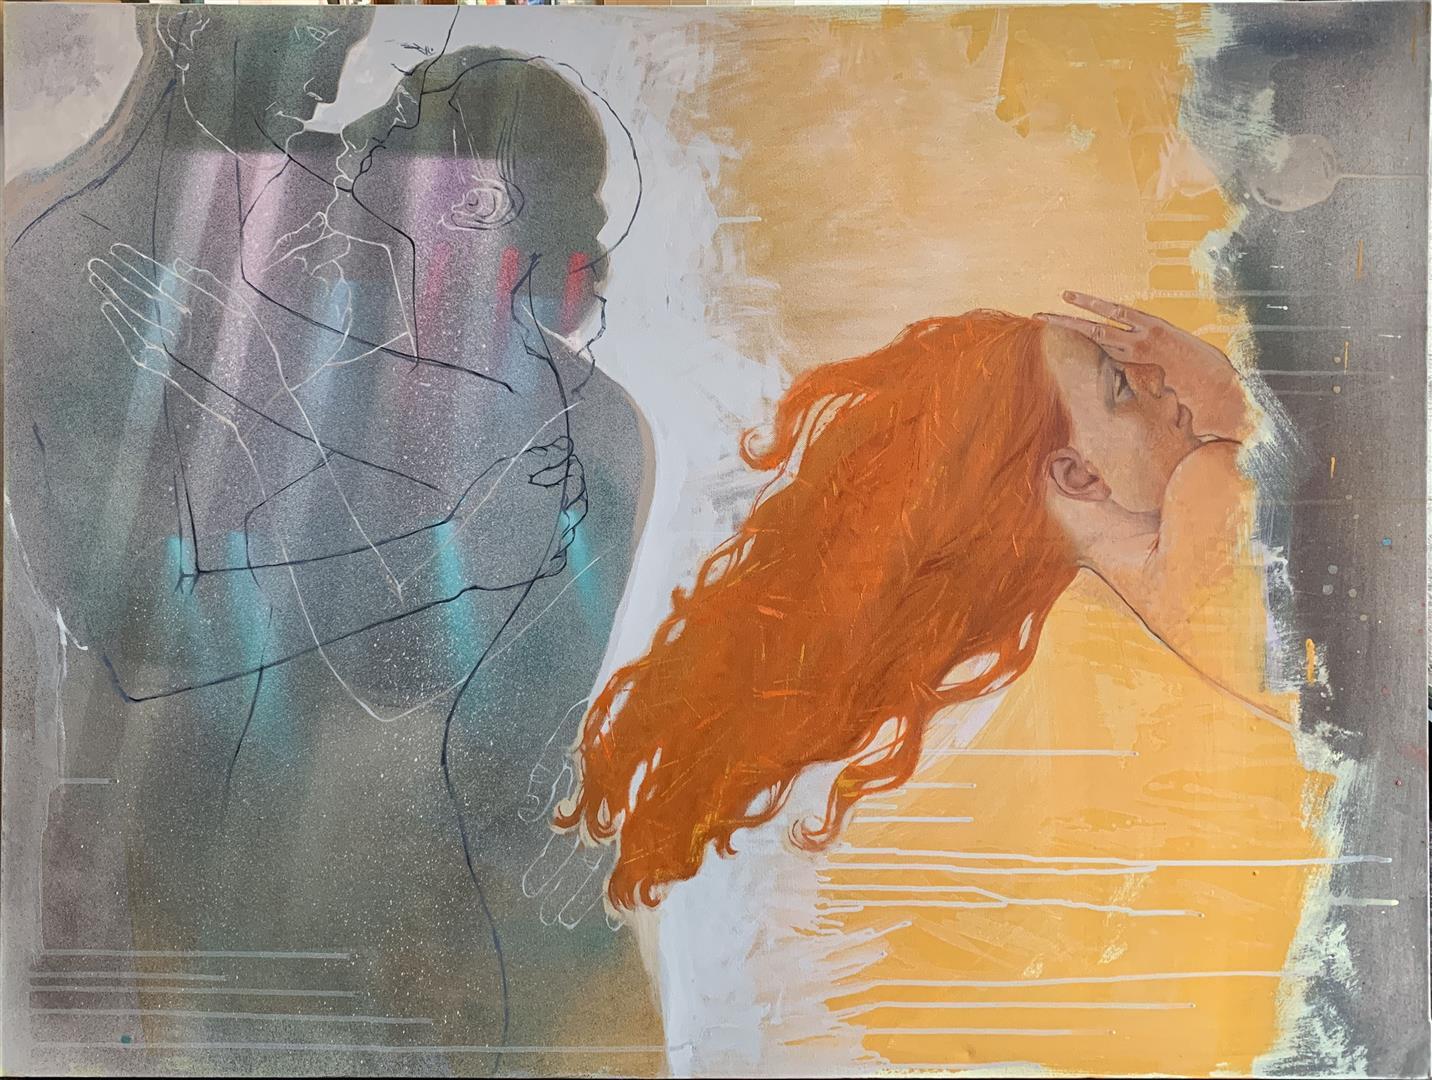 Julia Mordvinova Gilje: Sanne drømmer Oljemaleri (90x120 cm) kr 18000 ur